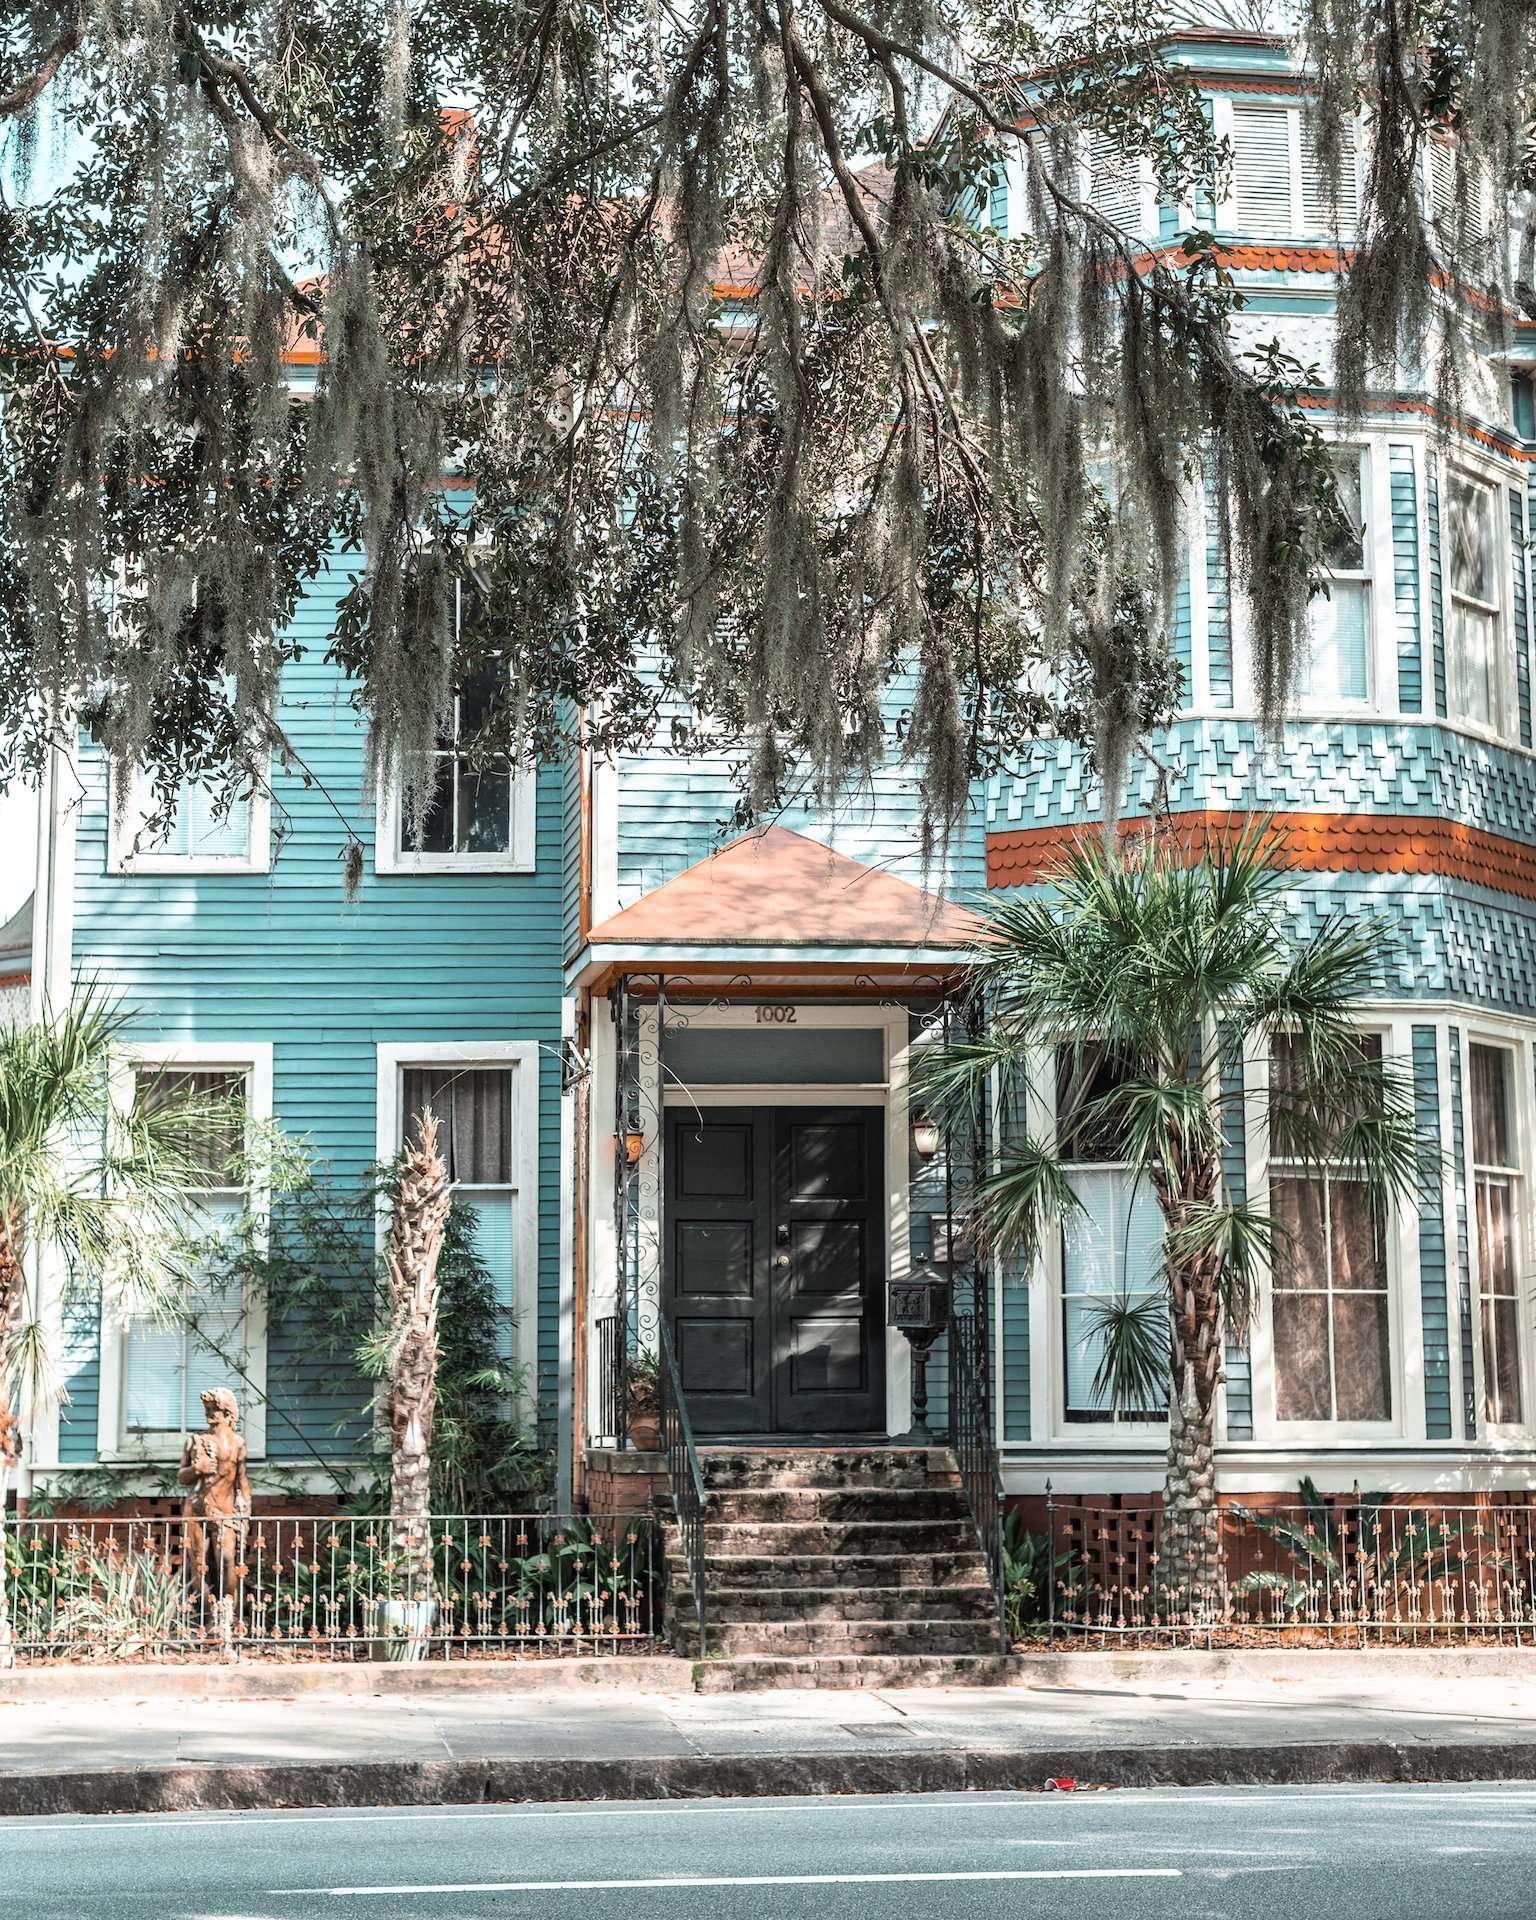 blue house on Drayton Street, Savannah